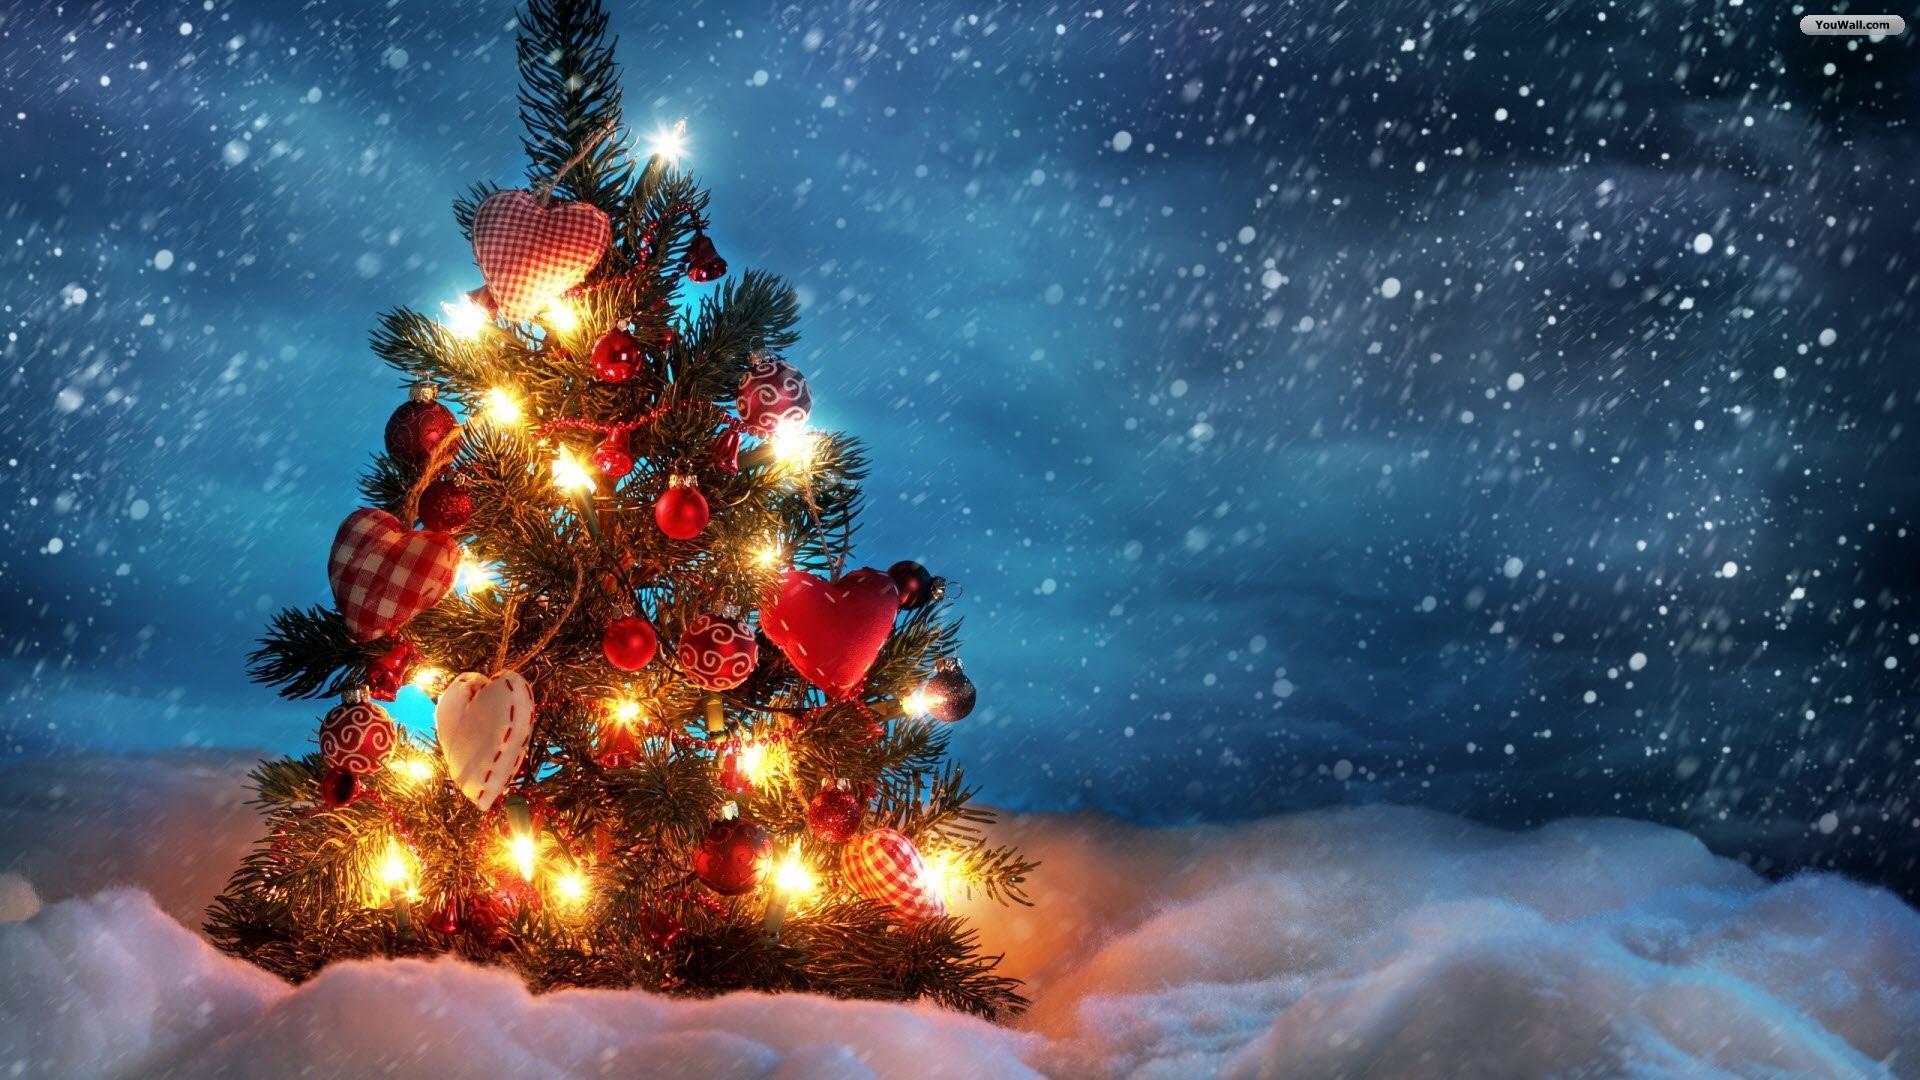 Explore Christmas Tree Wallpaper, Xmas Tree, and more!